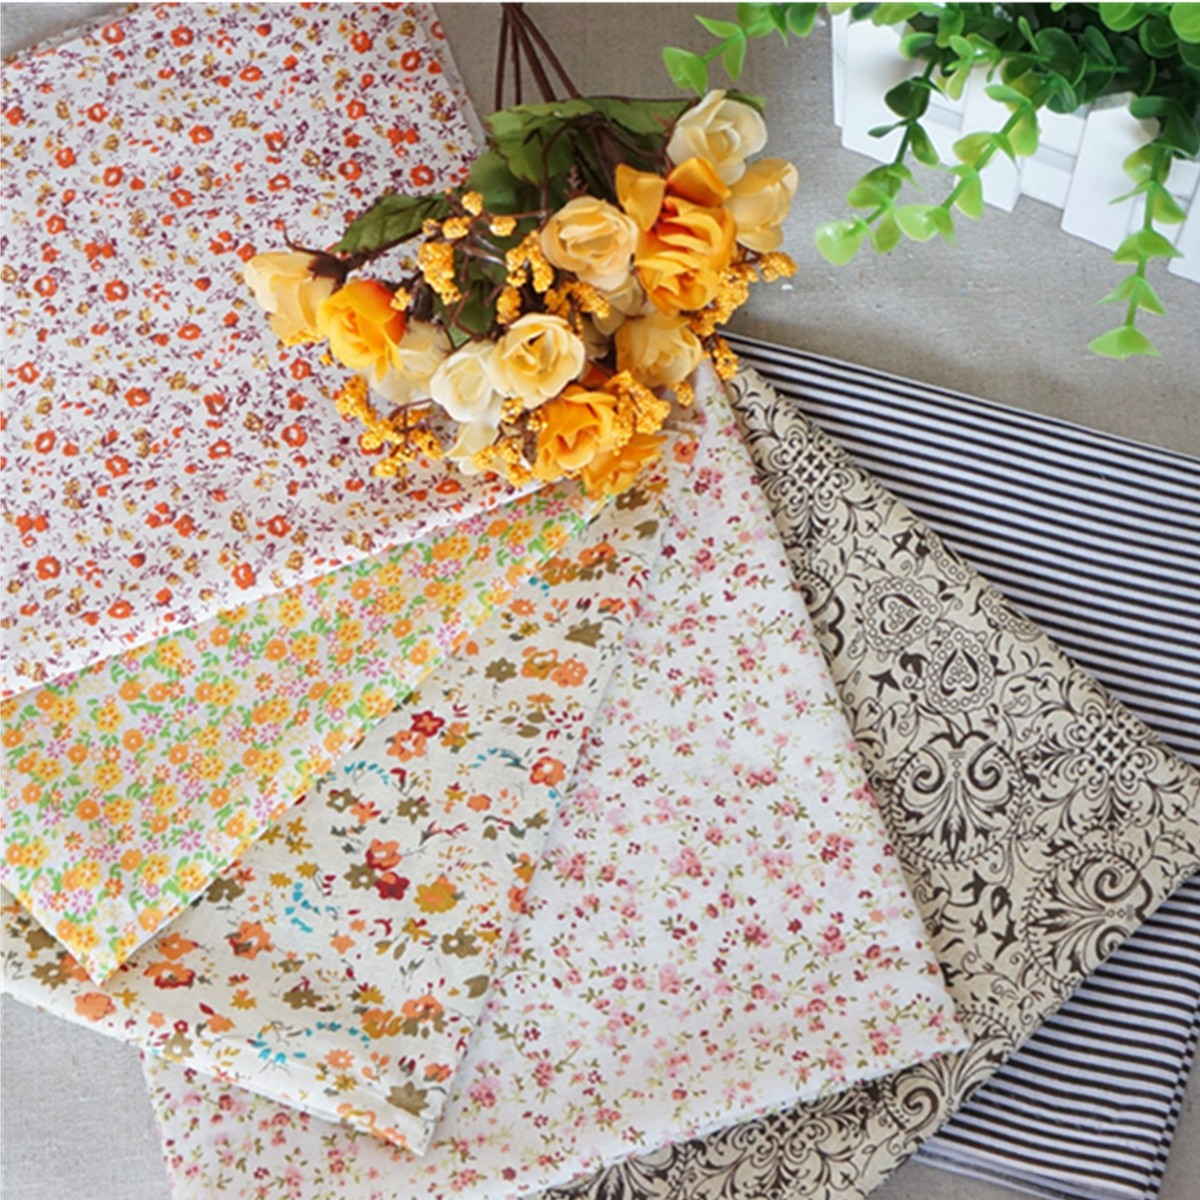 16Pcs Cotton Fabric bundles Fat Eighths Polycotton Material Florals Gingham Spots Craft Cotton fabric